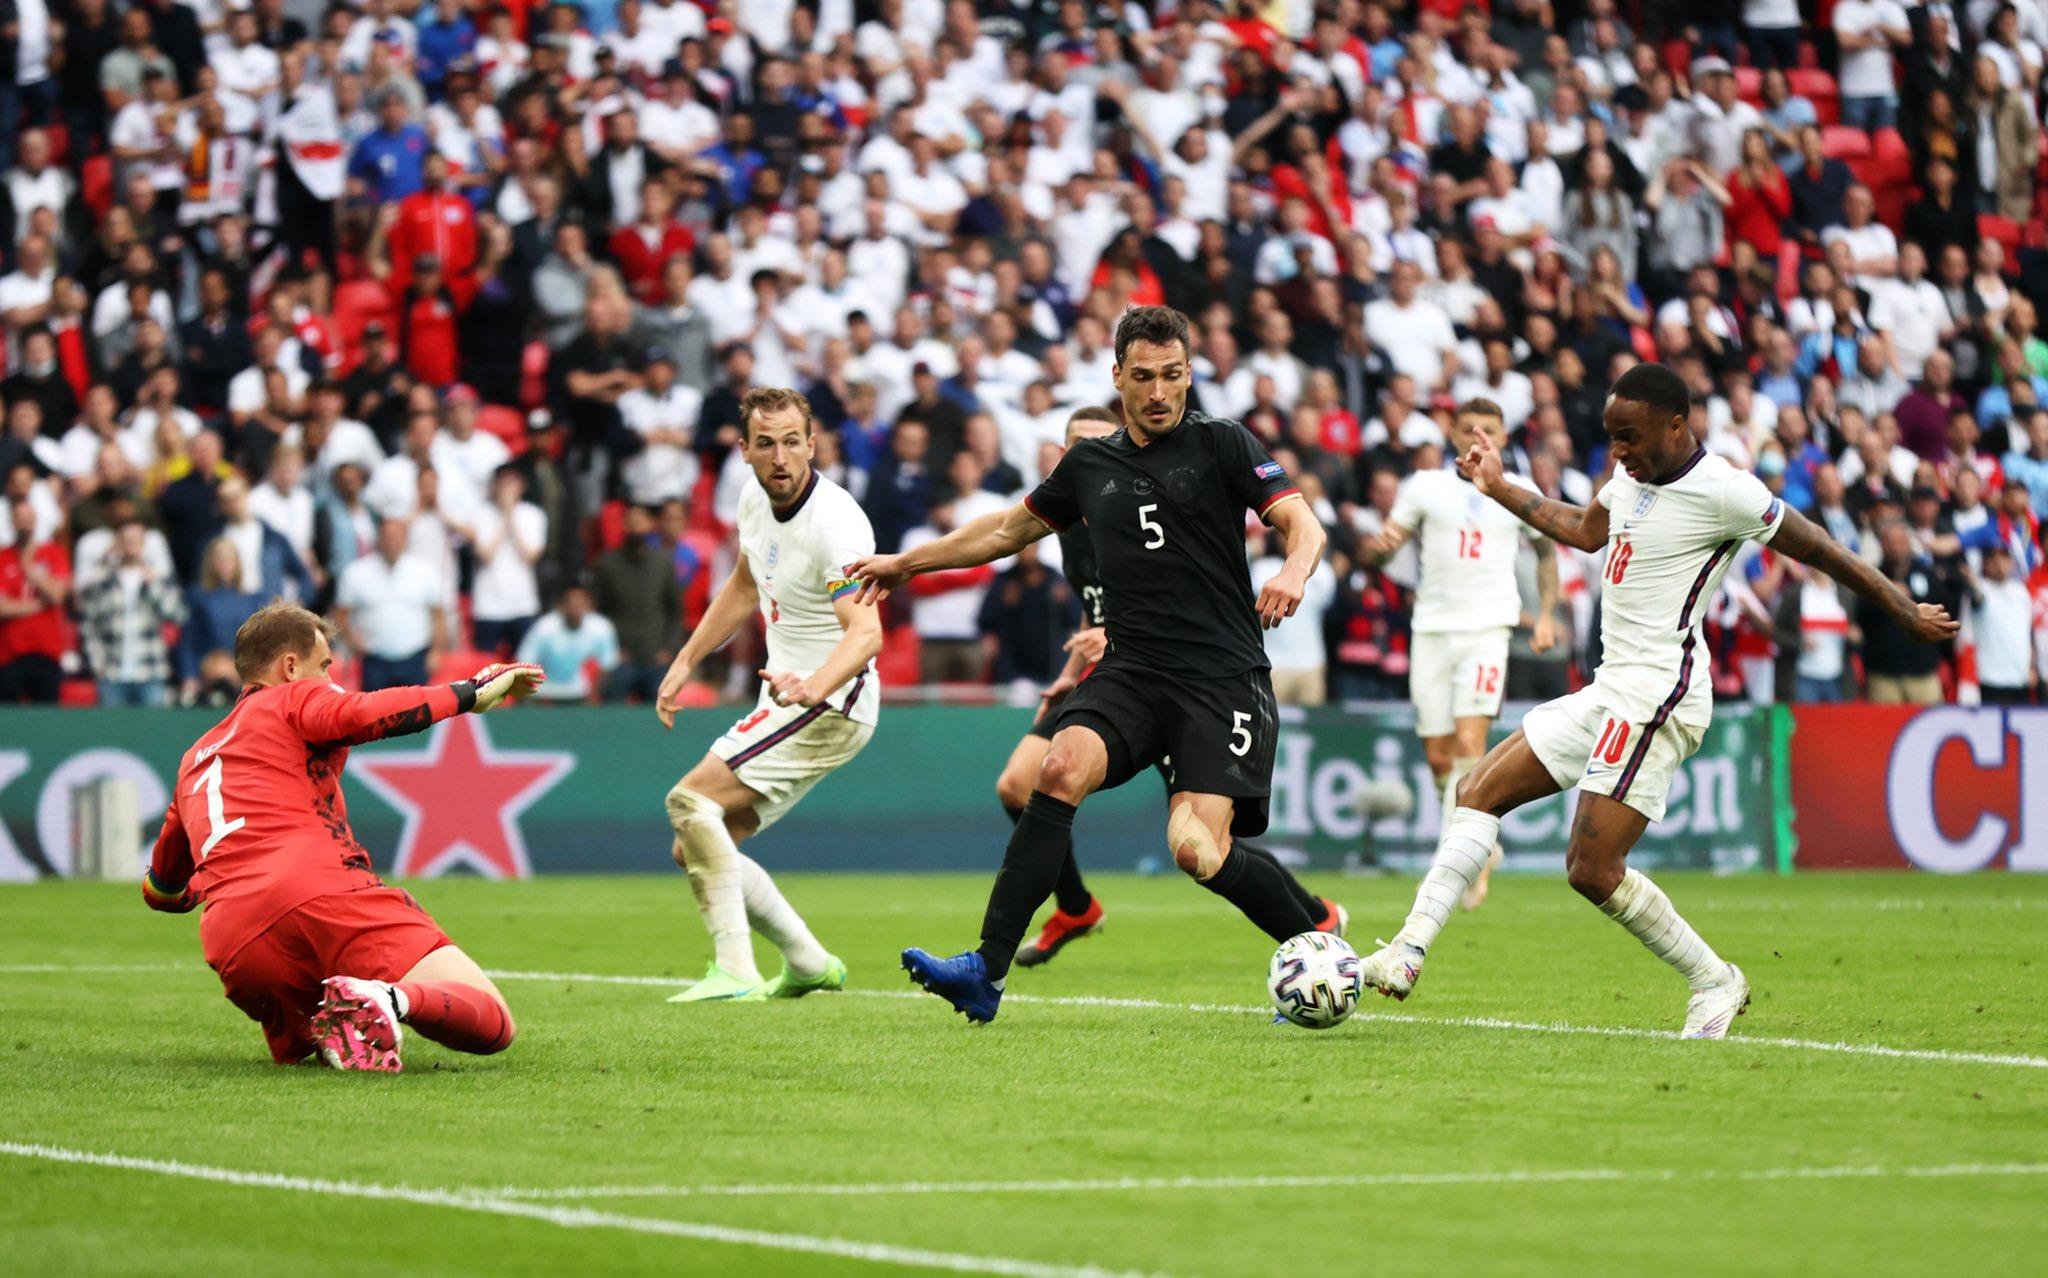 Jerman disebut-sebut bermain tanpa determinasi dalam pertandingan di Wembley pada 29 Juni mendatang.  Foto: FA